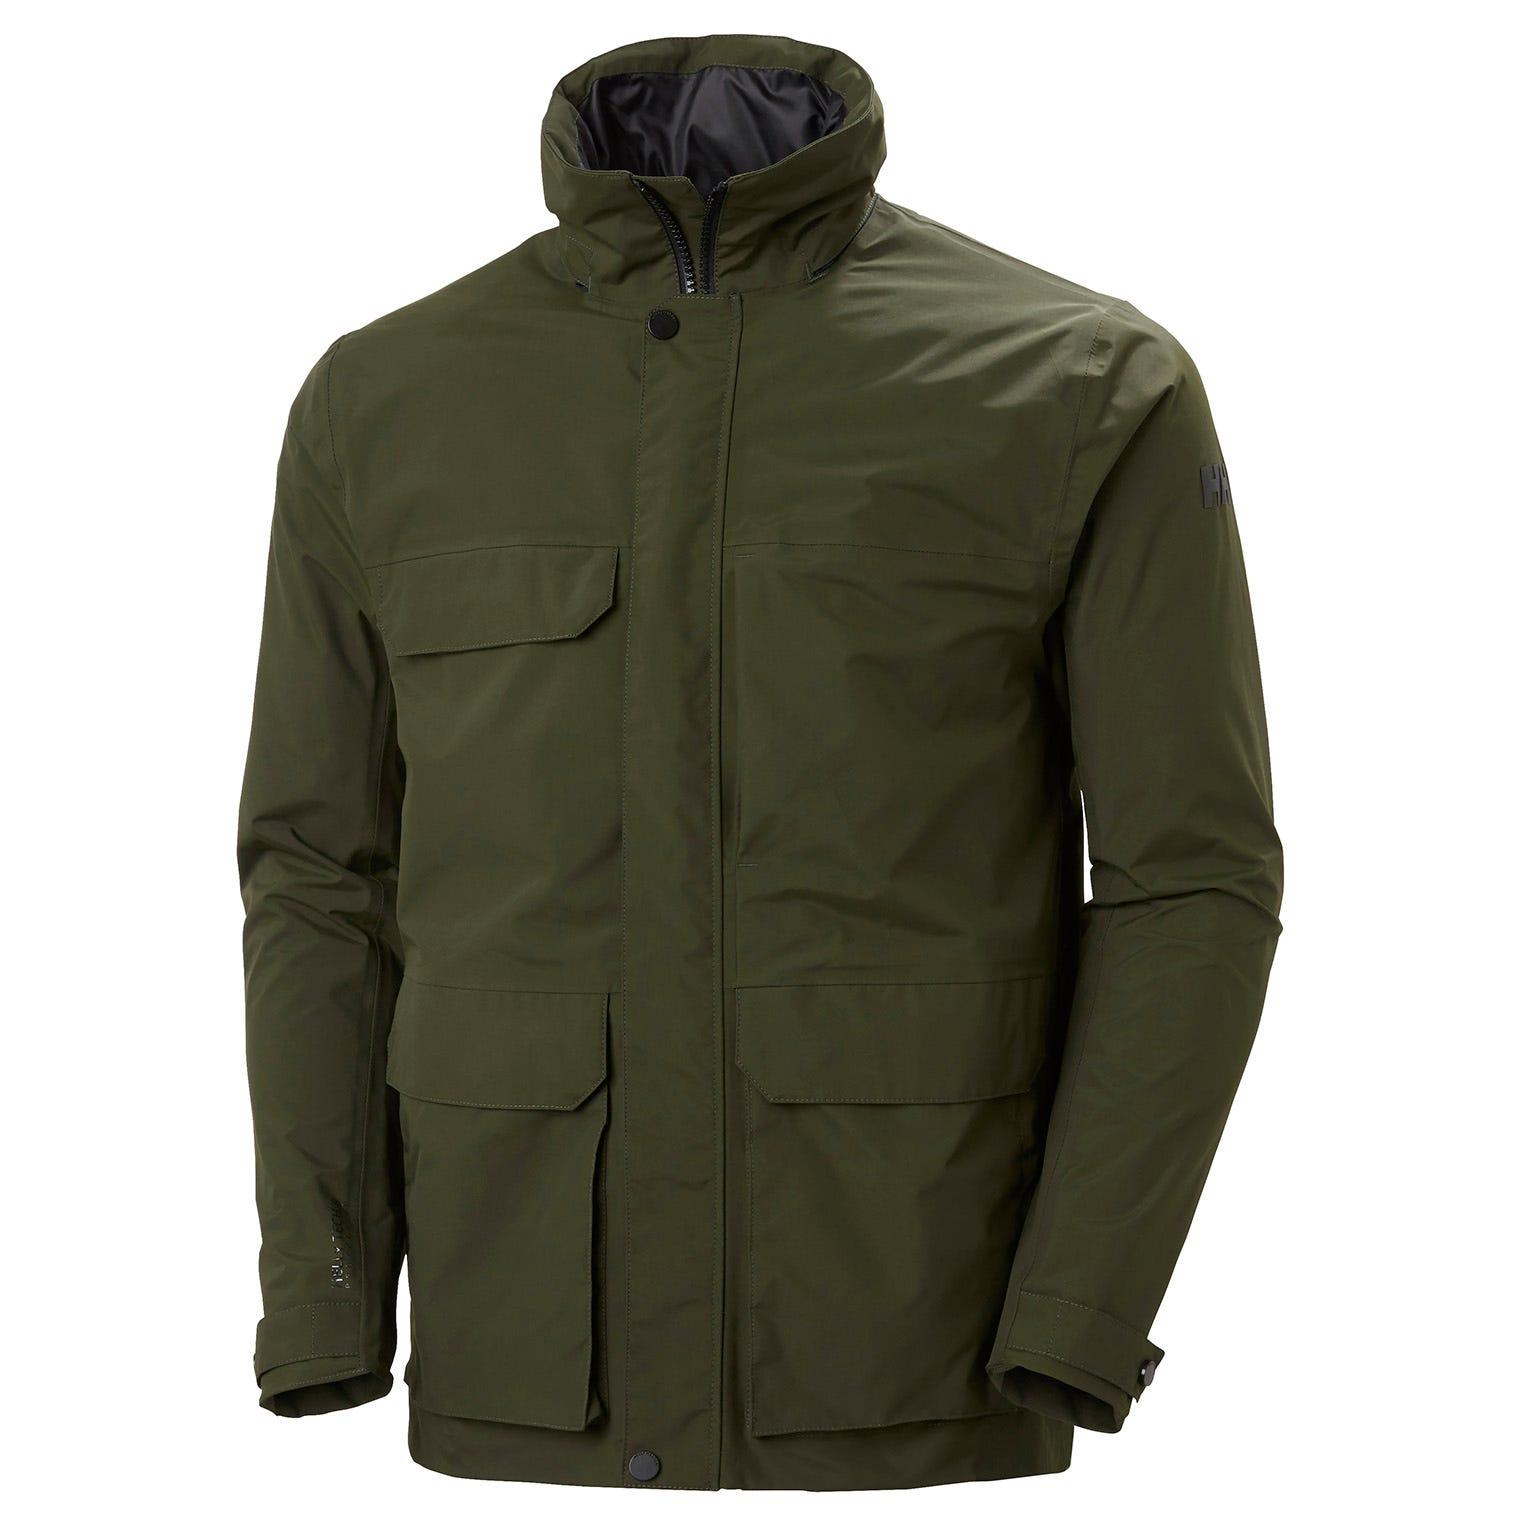 Helly Hansen Mens Utility Waterproof Rain Jacket Green M